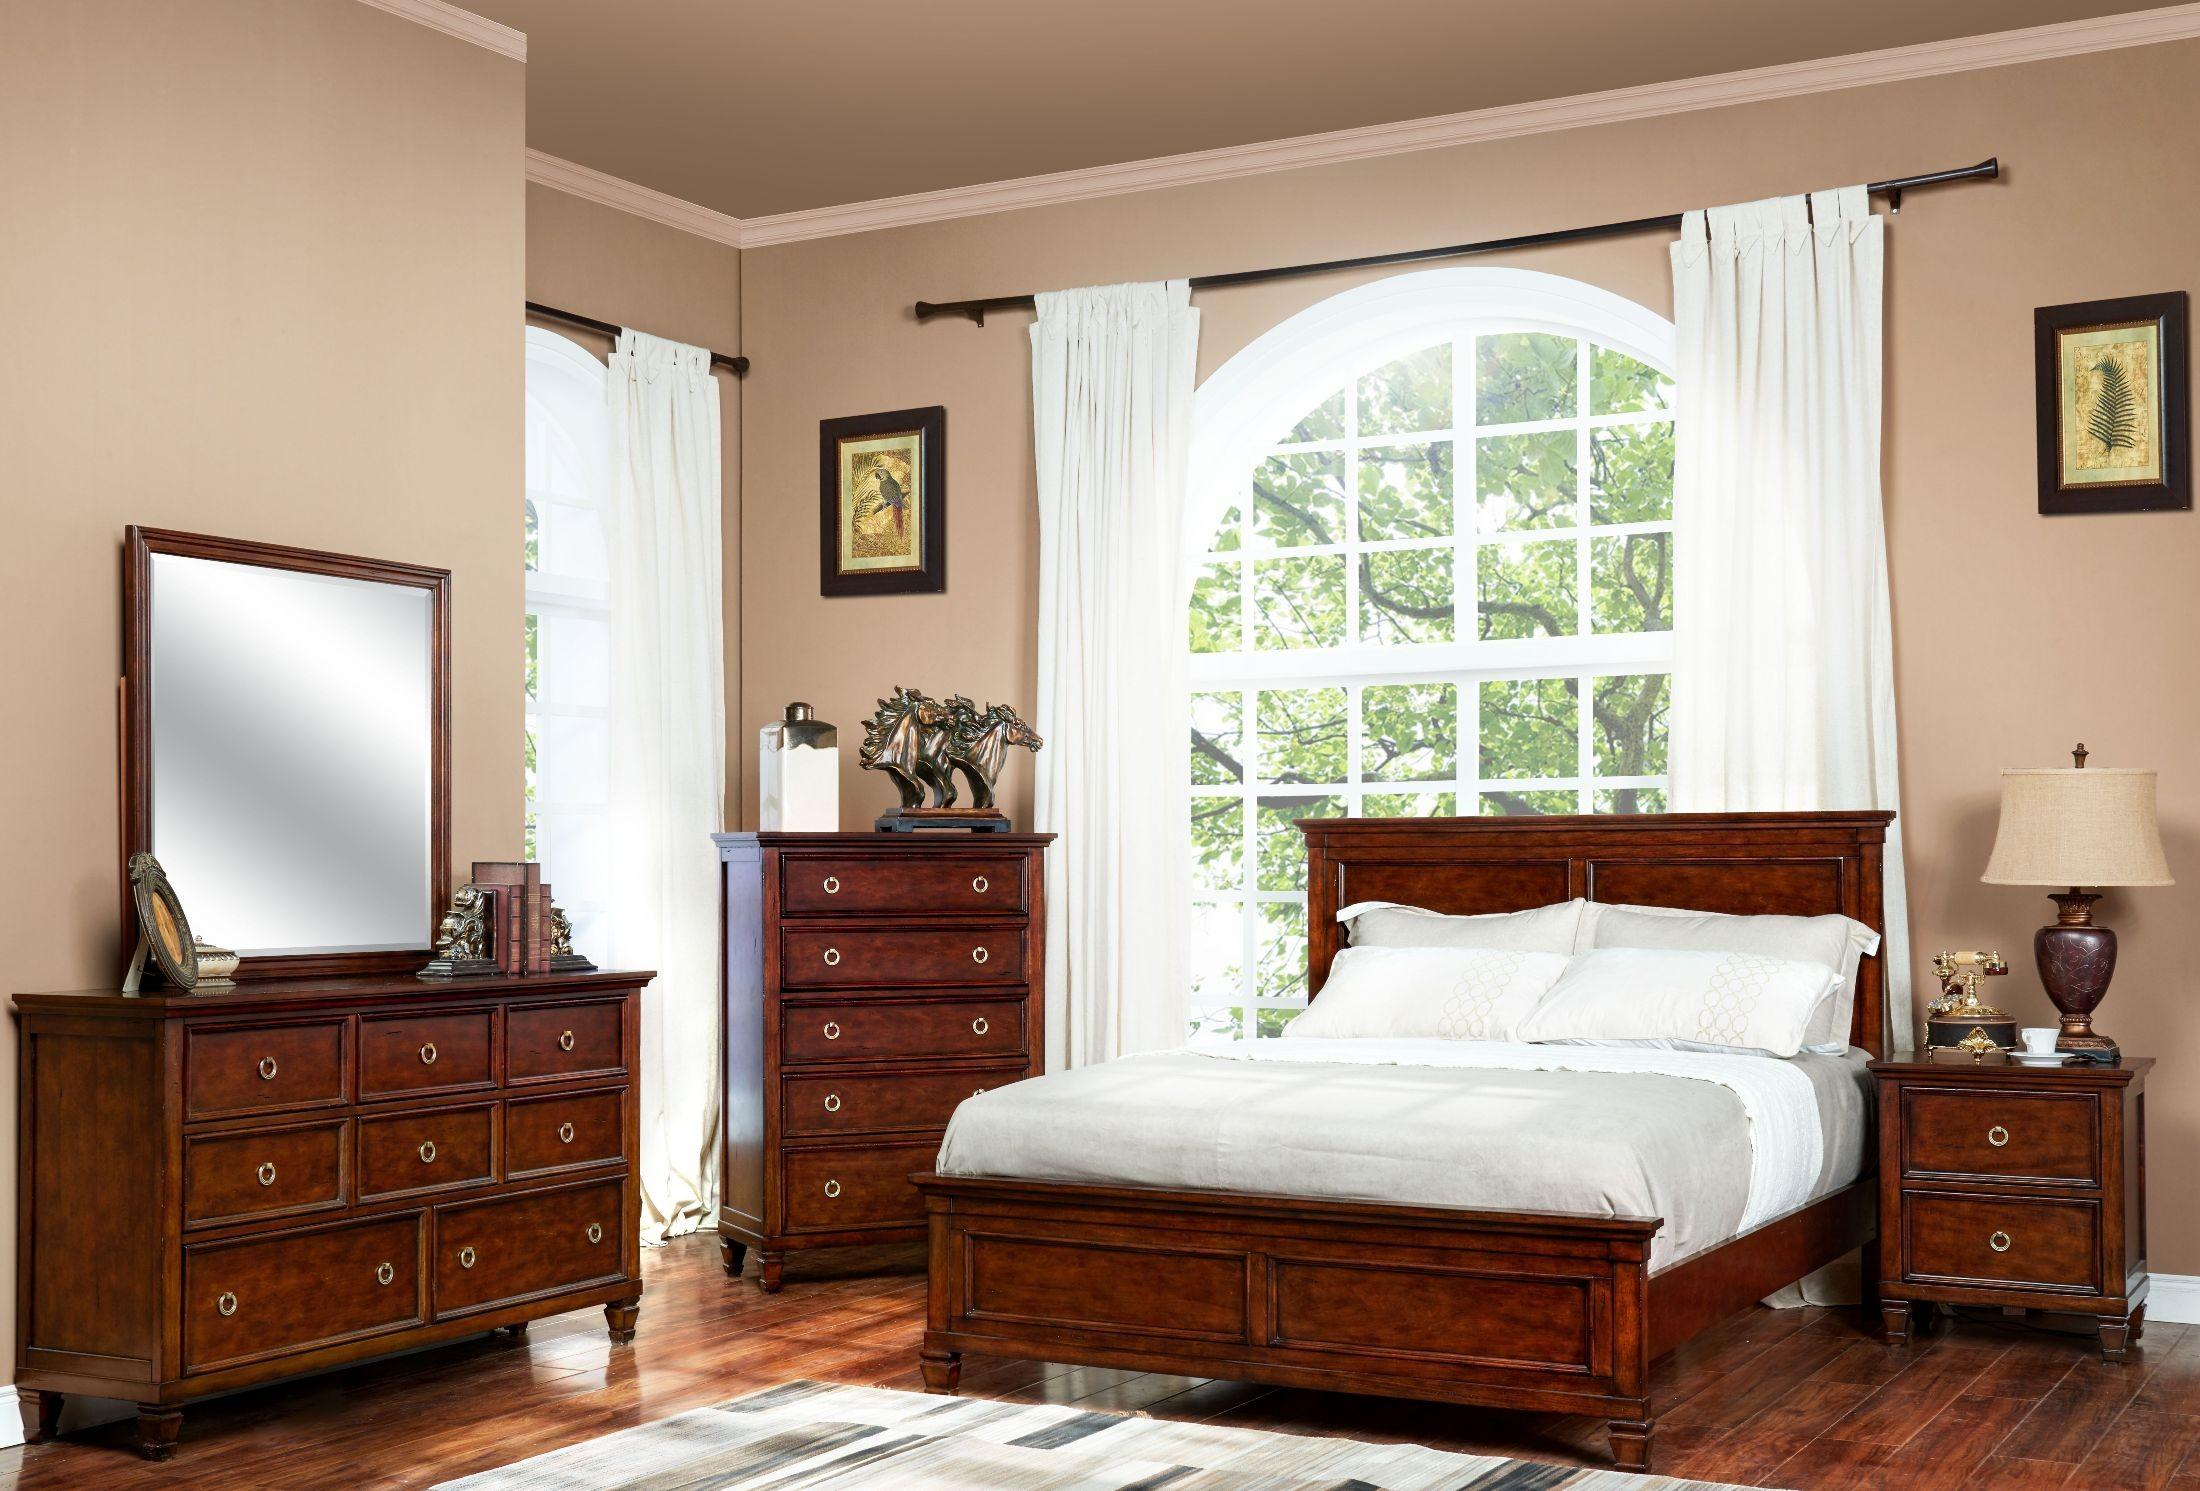 tamarack brown cherry panel bedroom set from new classic coleman furniture. Black Bedroom Furniture Sets. Home Design Ideas